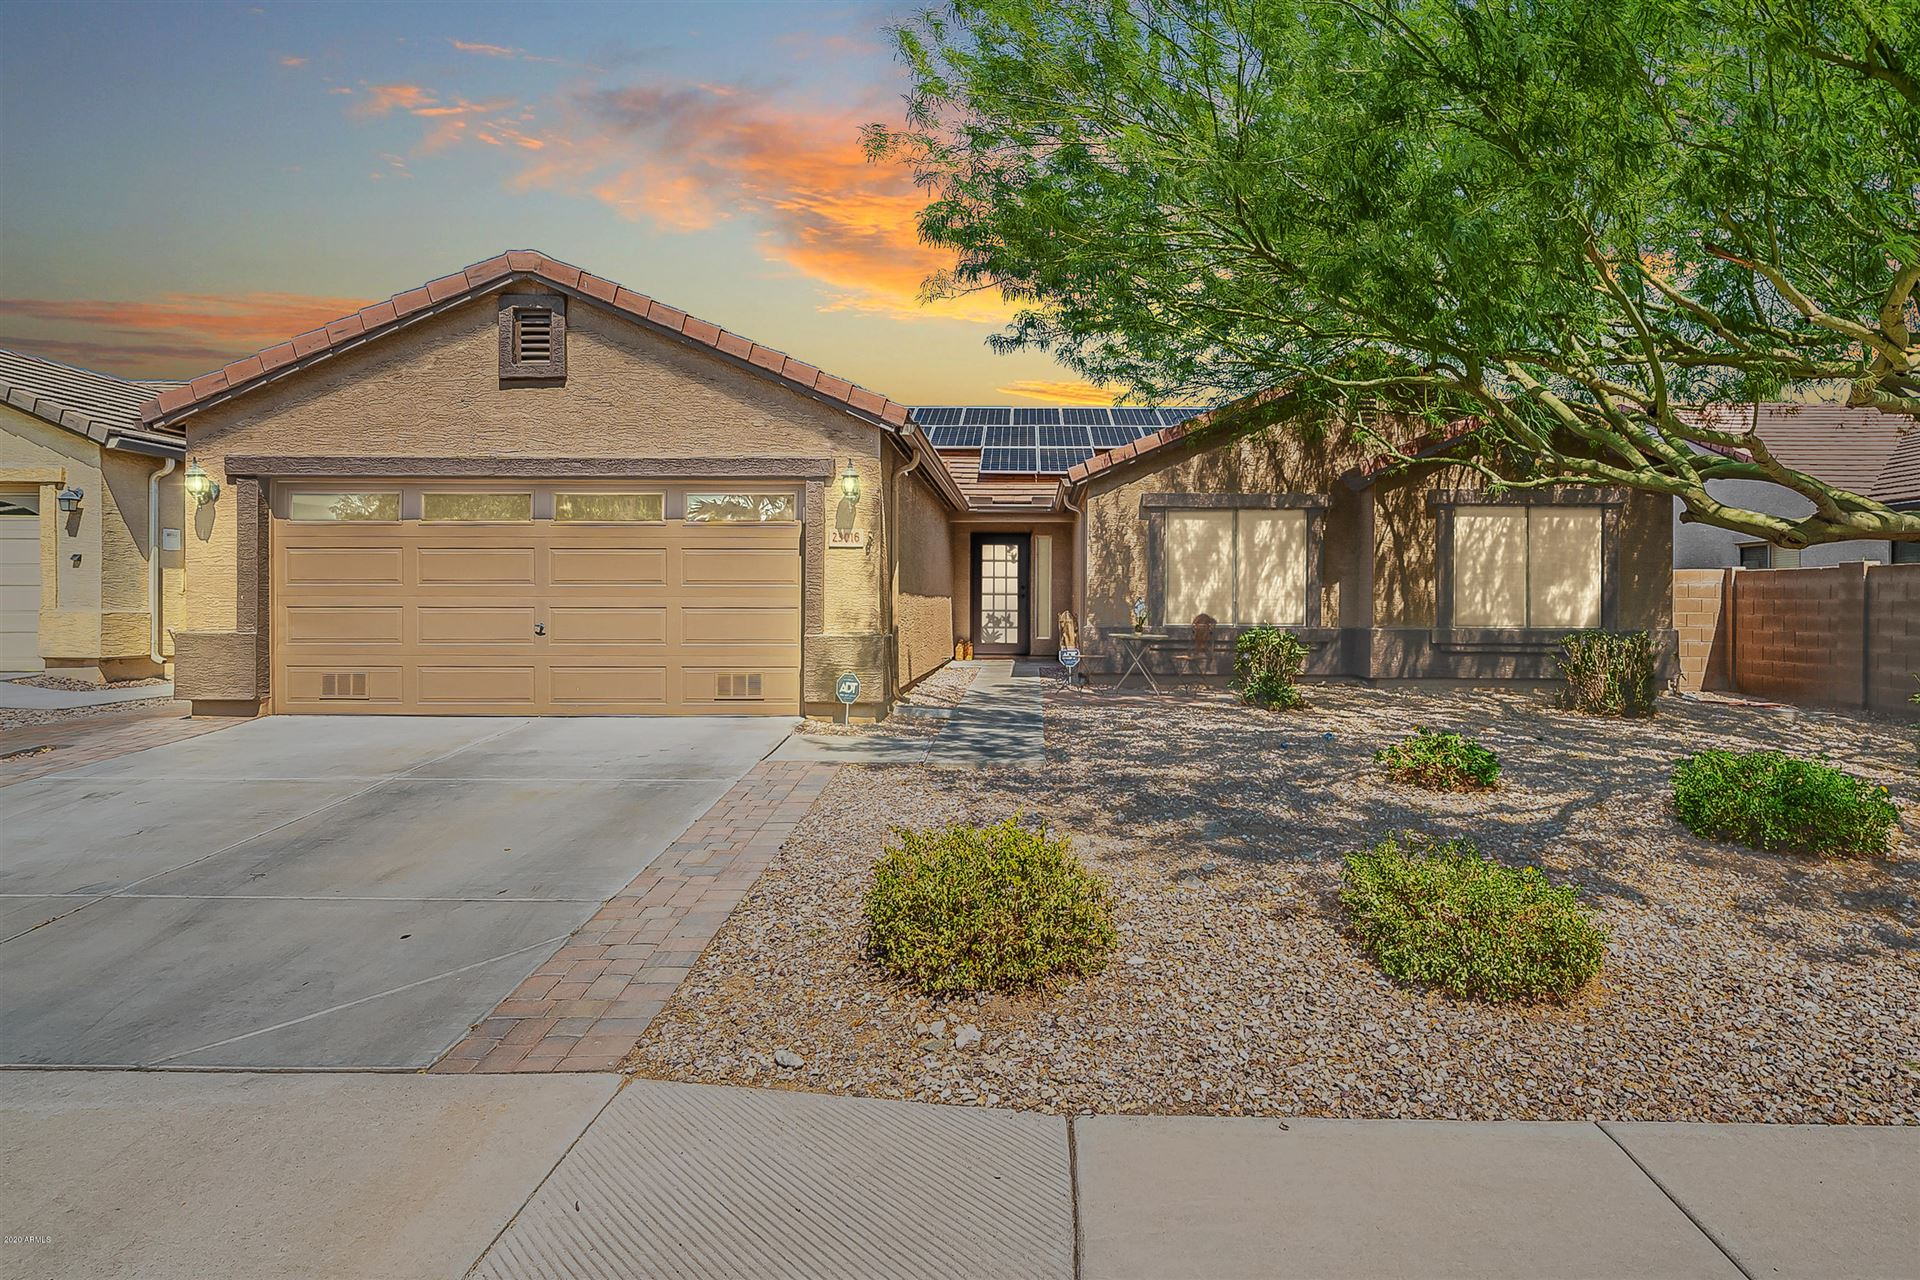 23016 W GARDENIA Drive, Buckeye, AZ 85326 - MLS#: 6127109